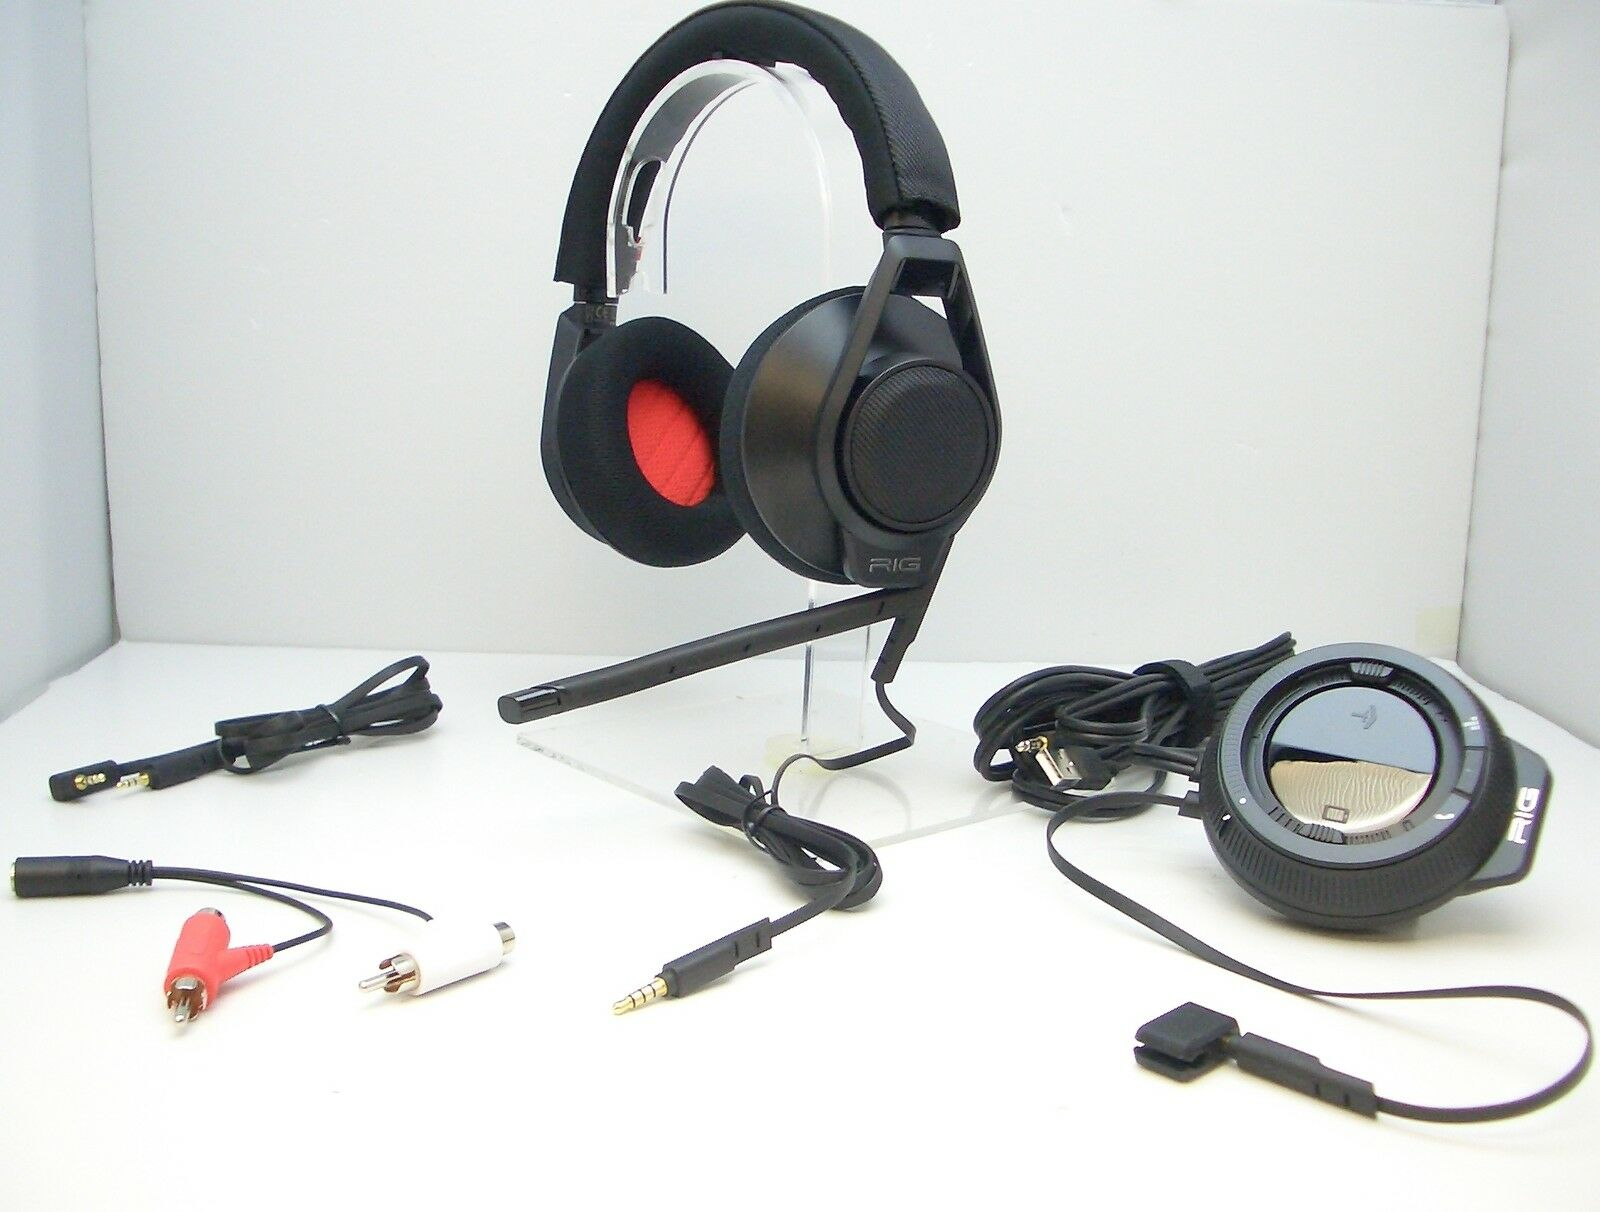 Headphone gaming headset - gaming headphone mixer